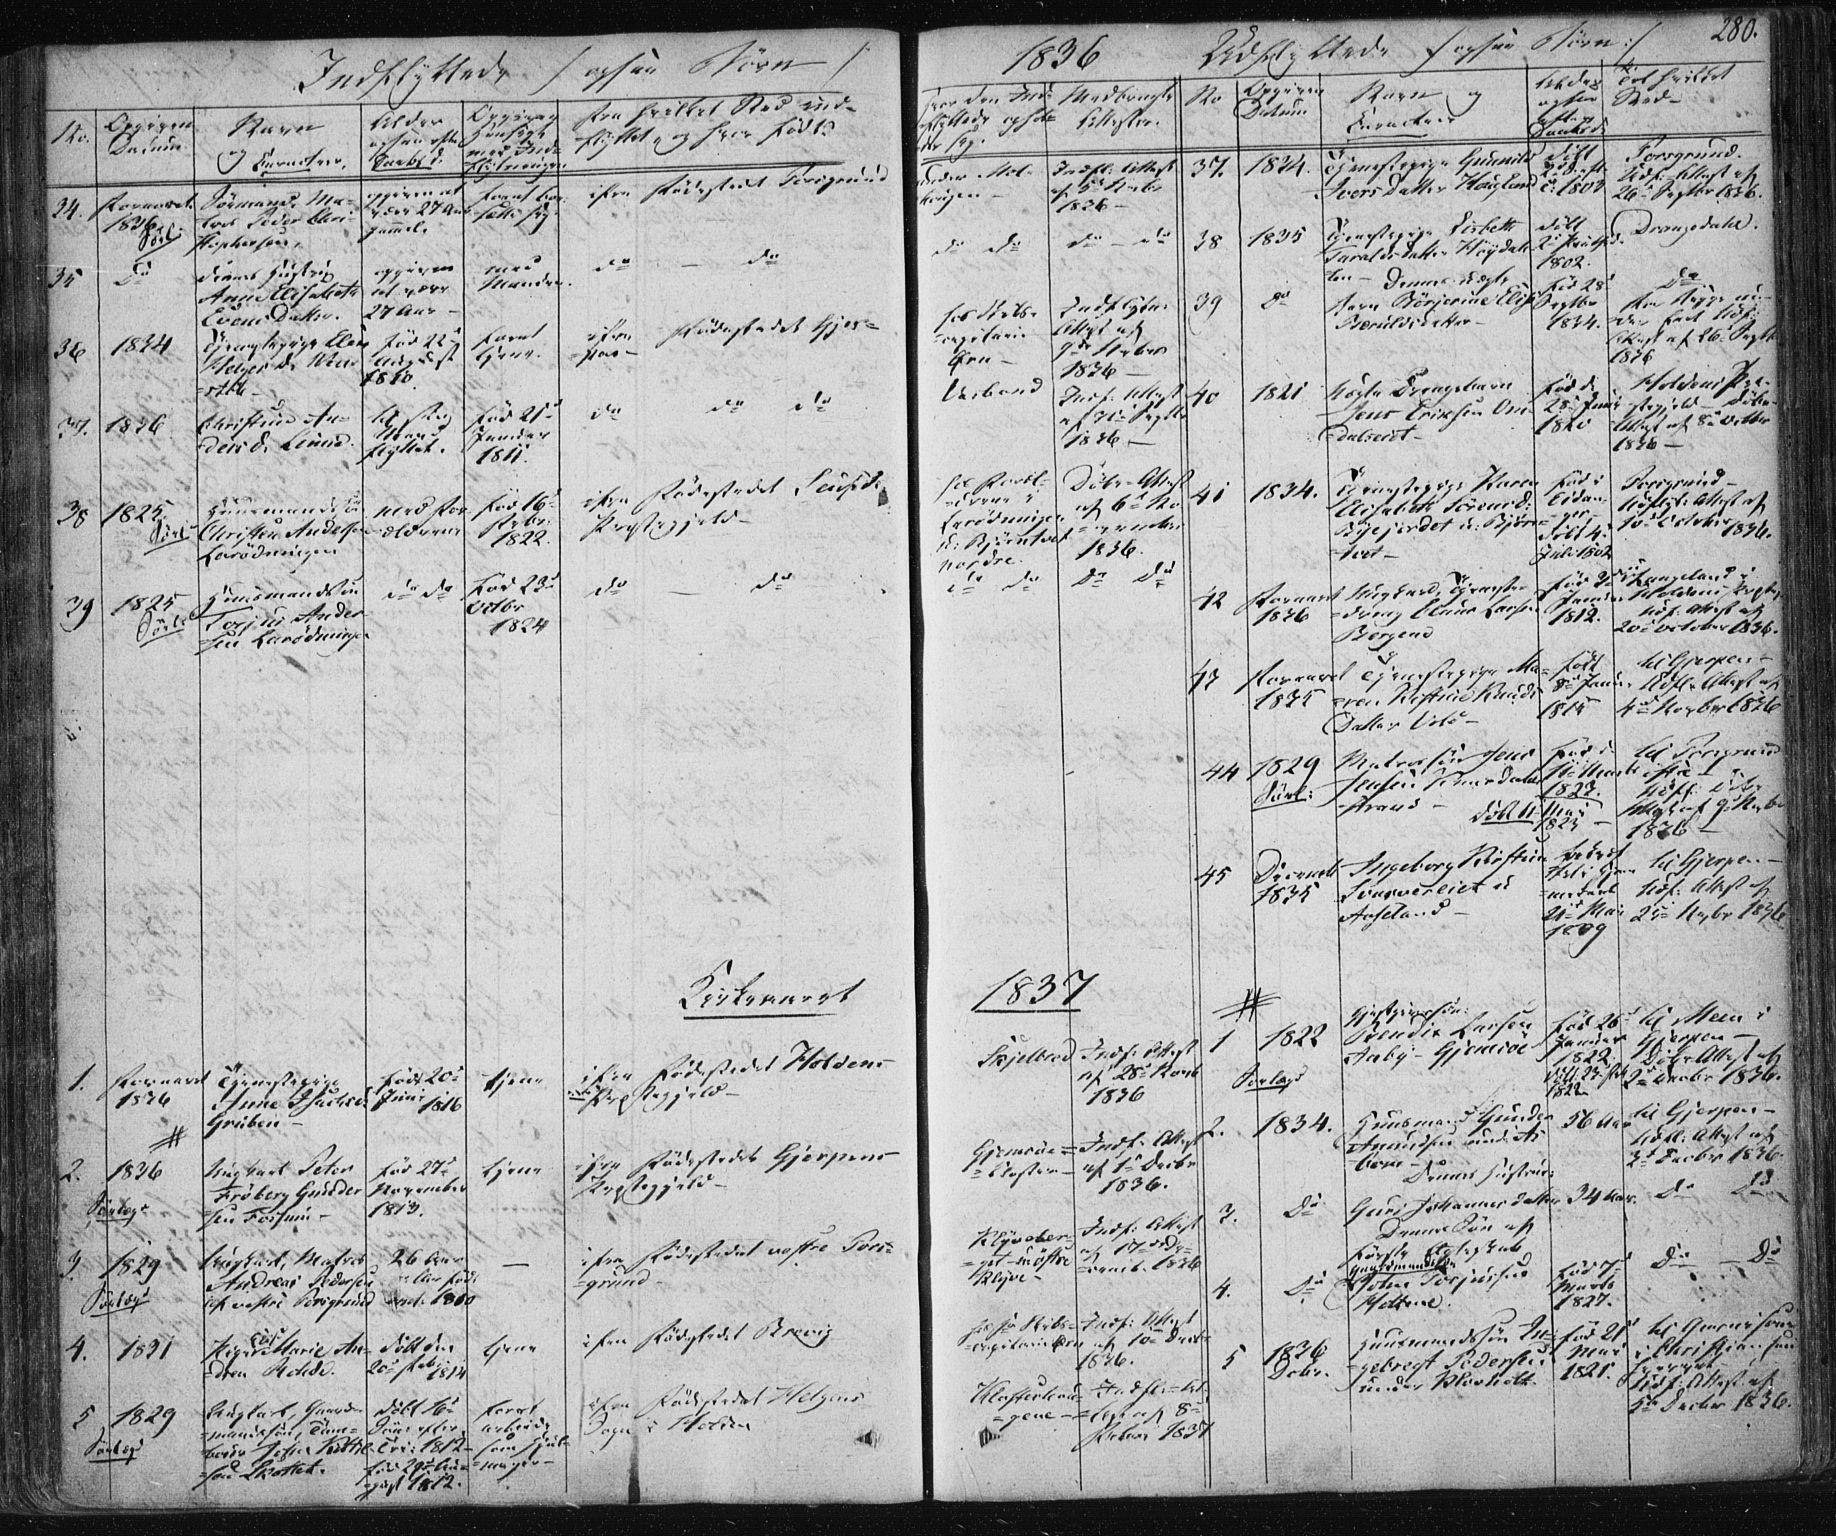 SAKO, Solum kirkebøker, F/Fa/L0005: Ministerialbok nr. I 5, 1833-1843, s. 280